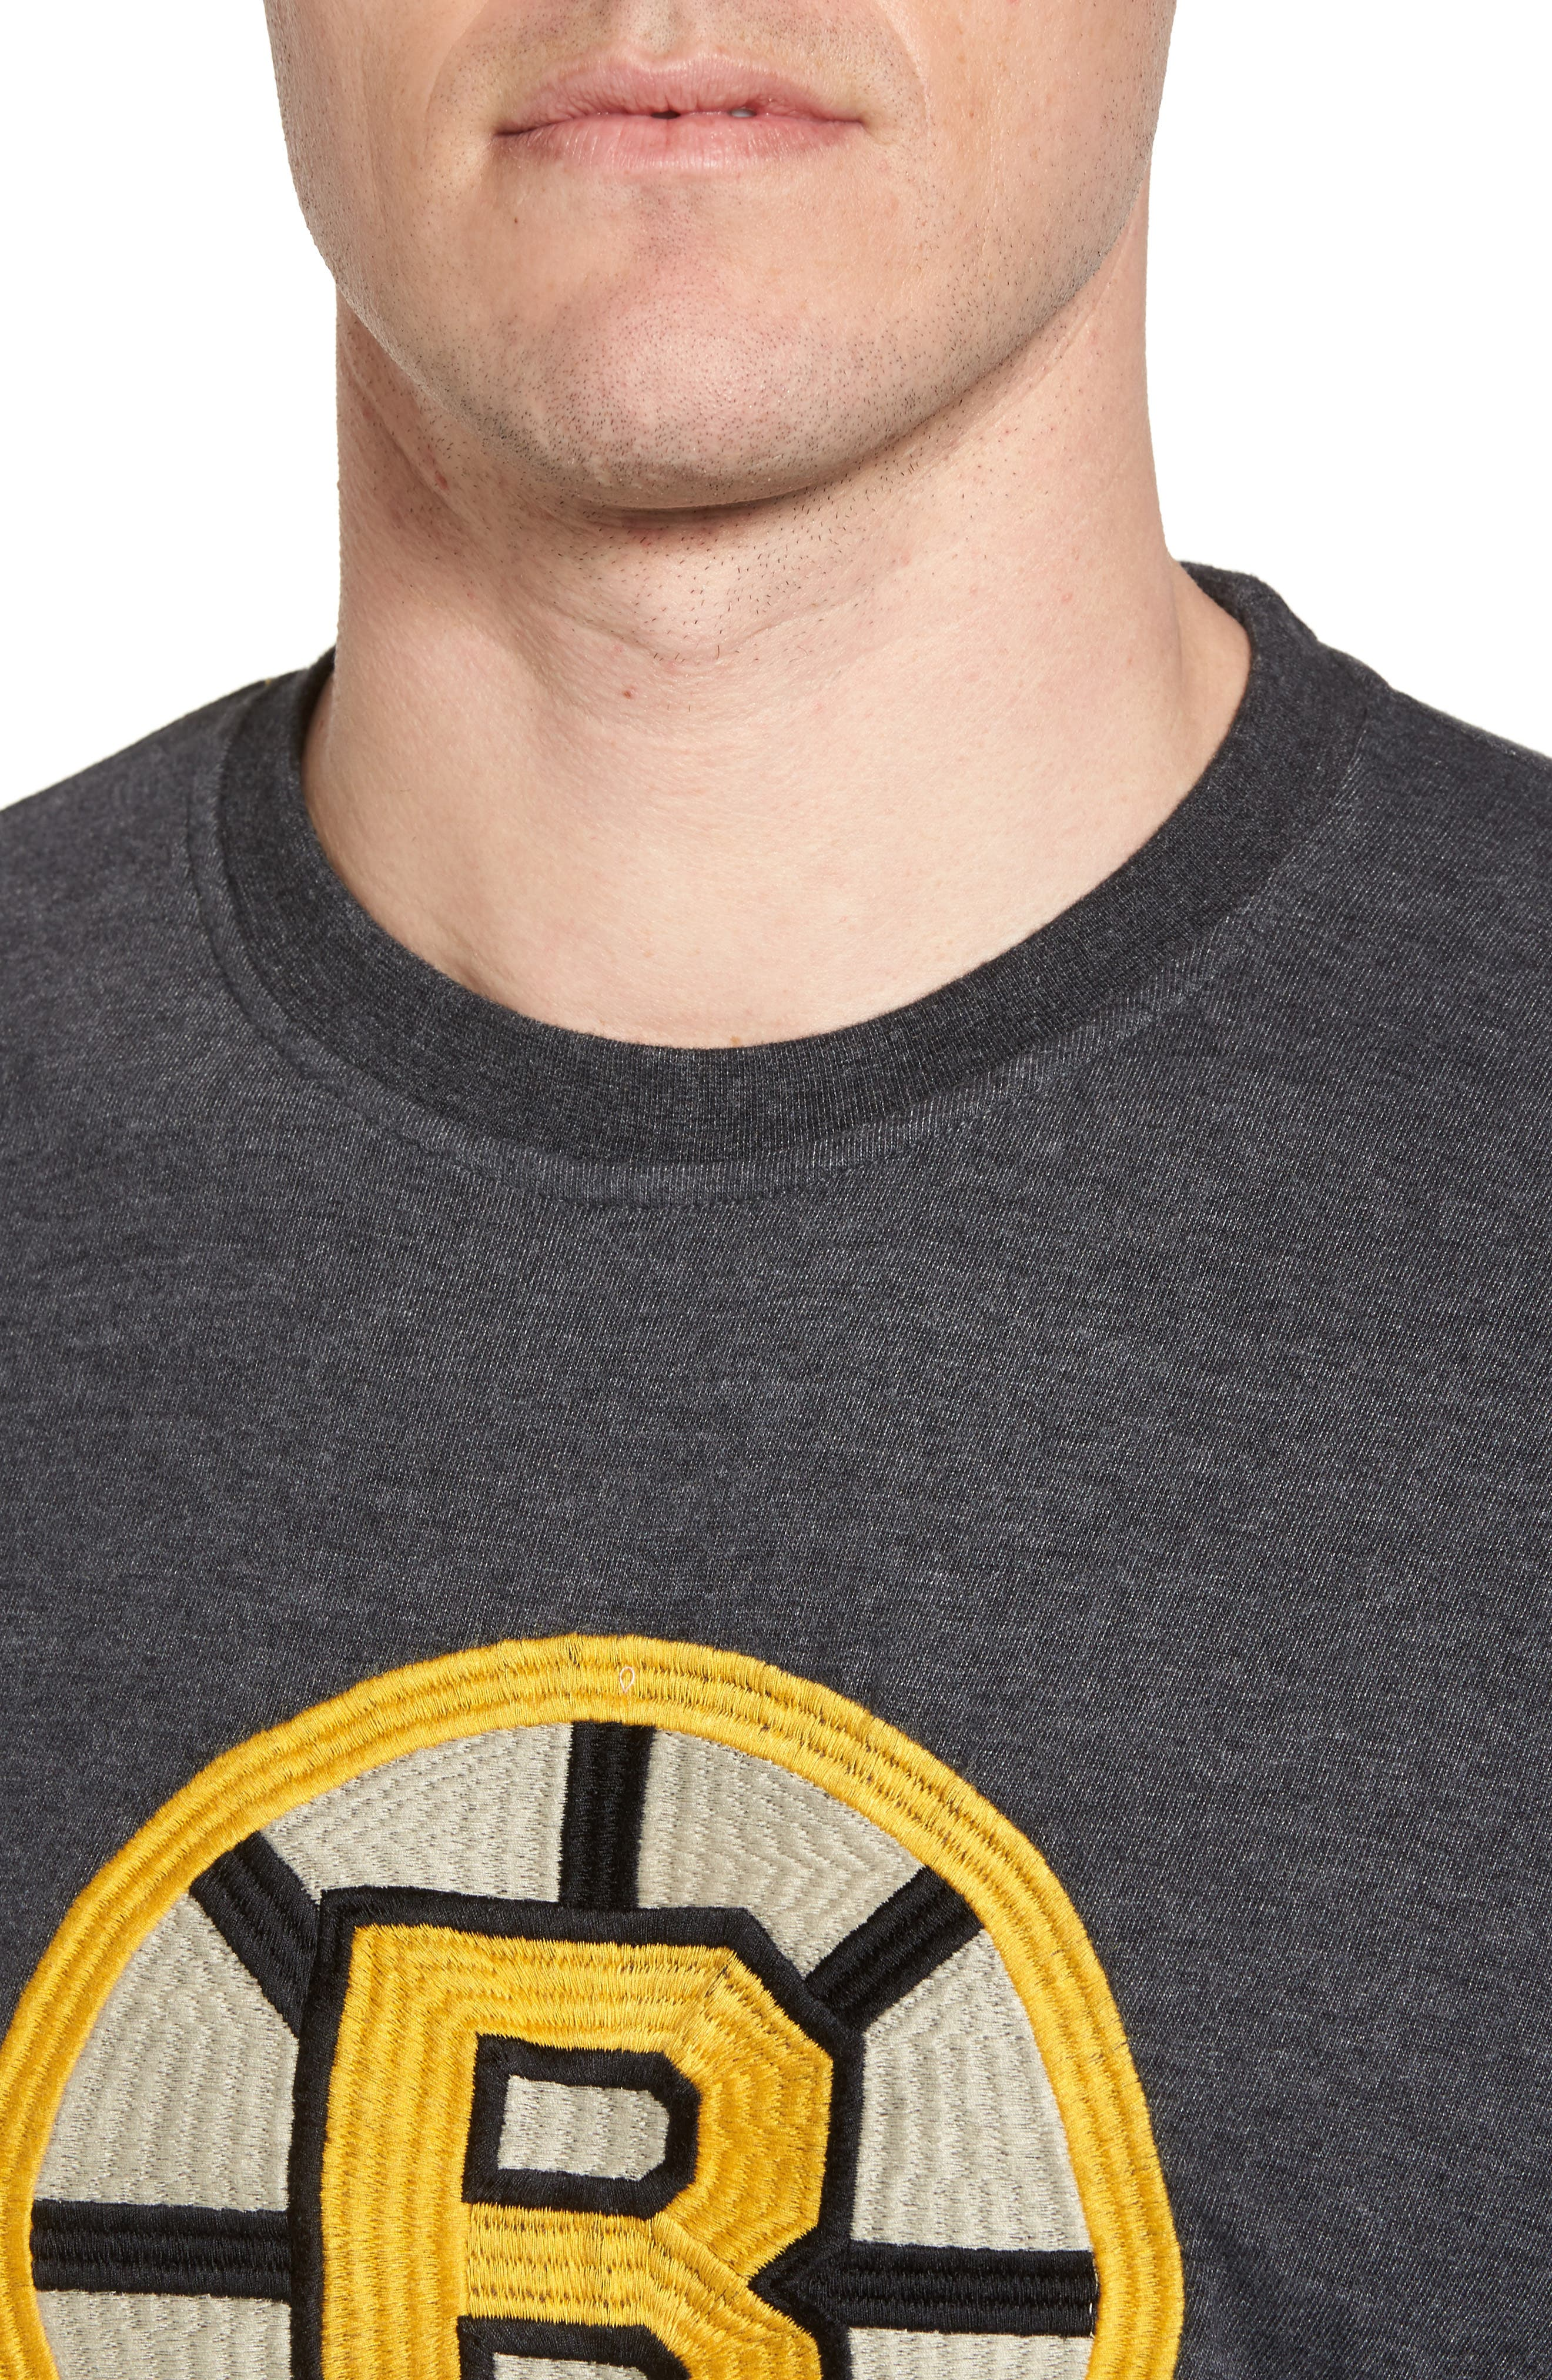 Hillwood Bruins T-Shirt,                             Alternate thumbnail 4, color,                             Heather Black